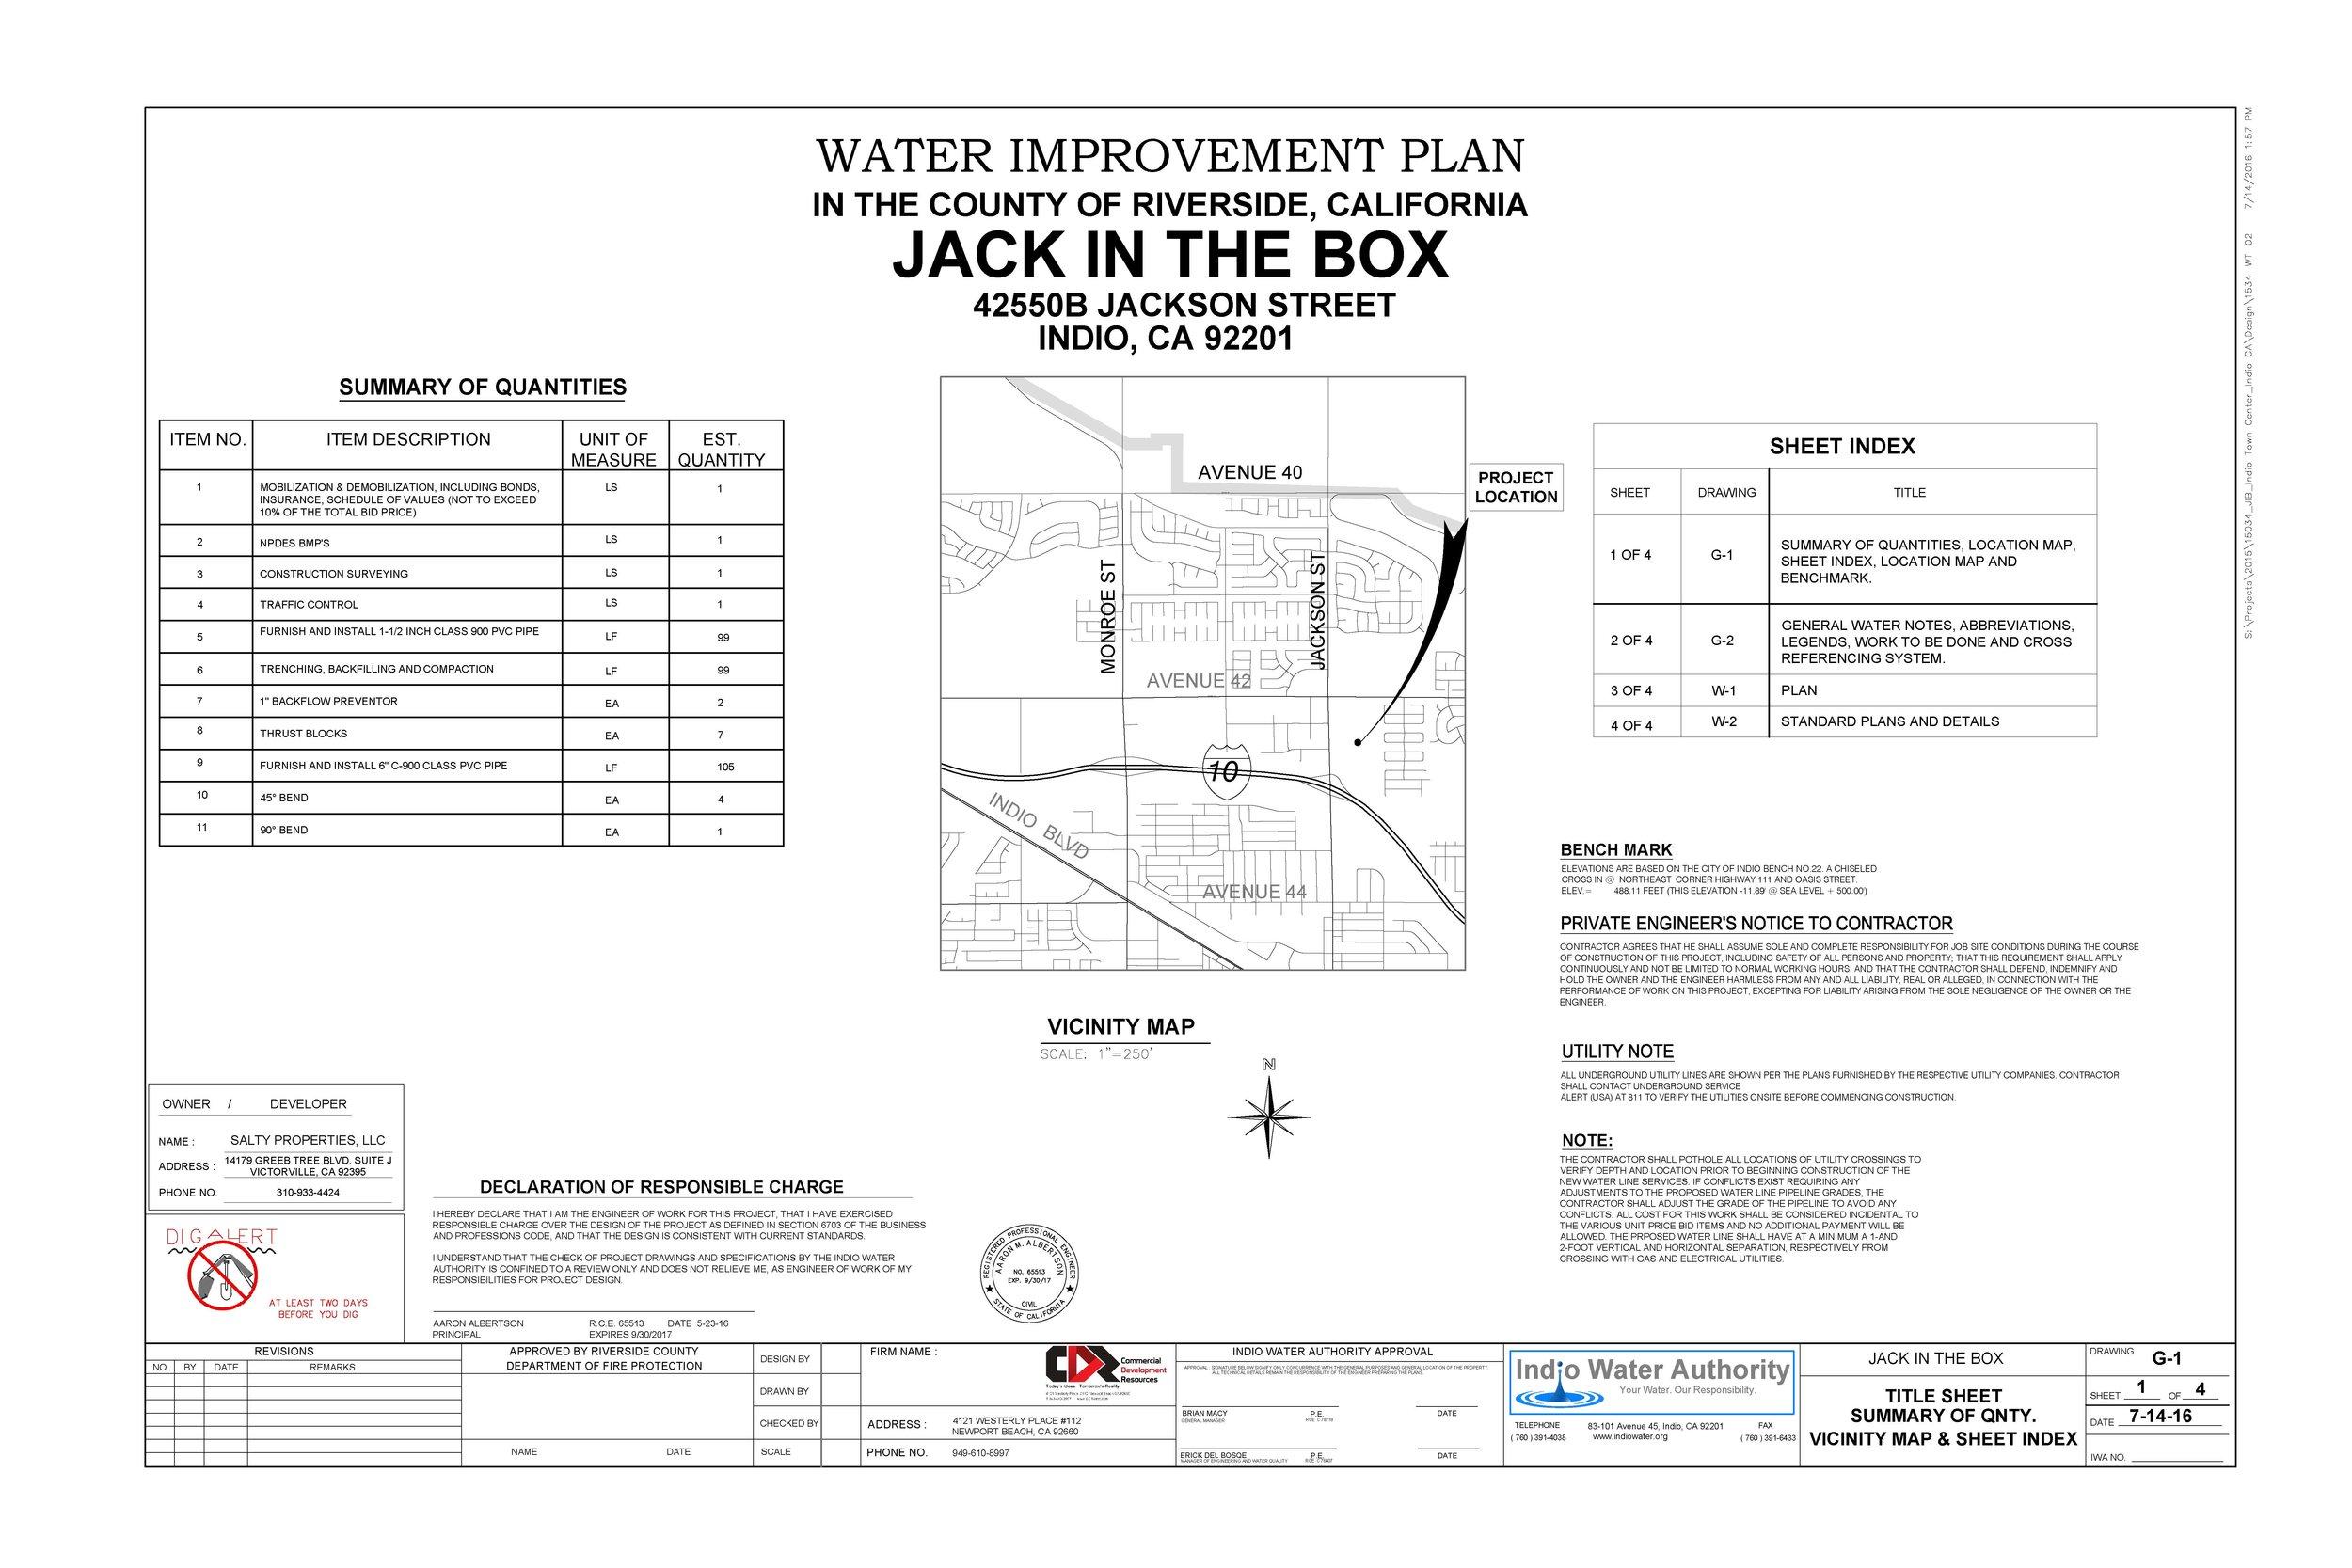 Jack in the Box indio (1).jpg